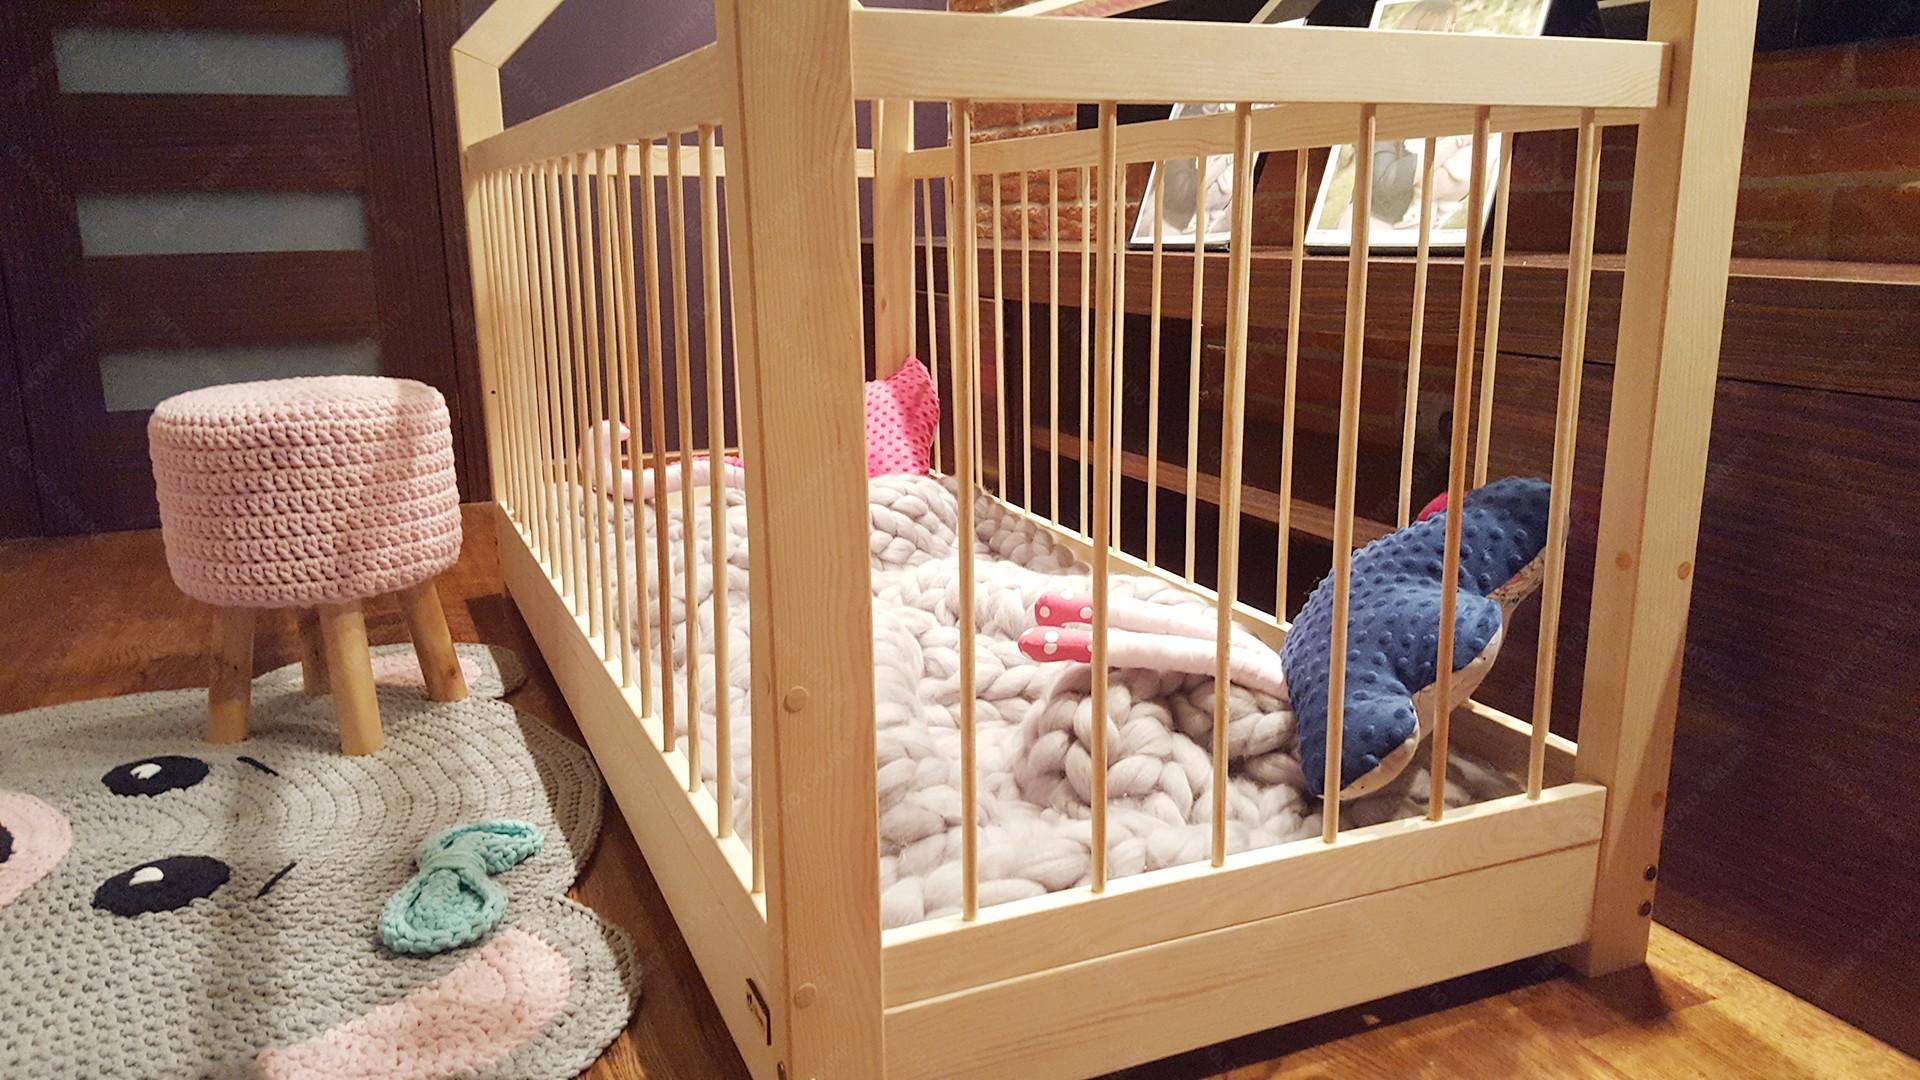 lit cabane dalia avec barri re 80 x 140cm. Black Bedroom Furniture Sets. Home Design Ideas